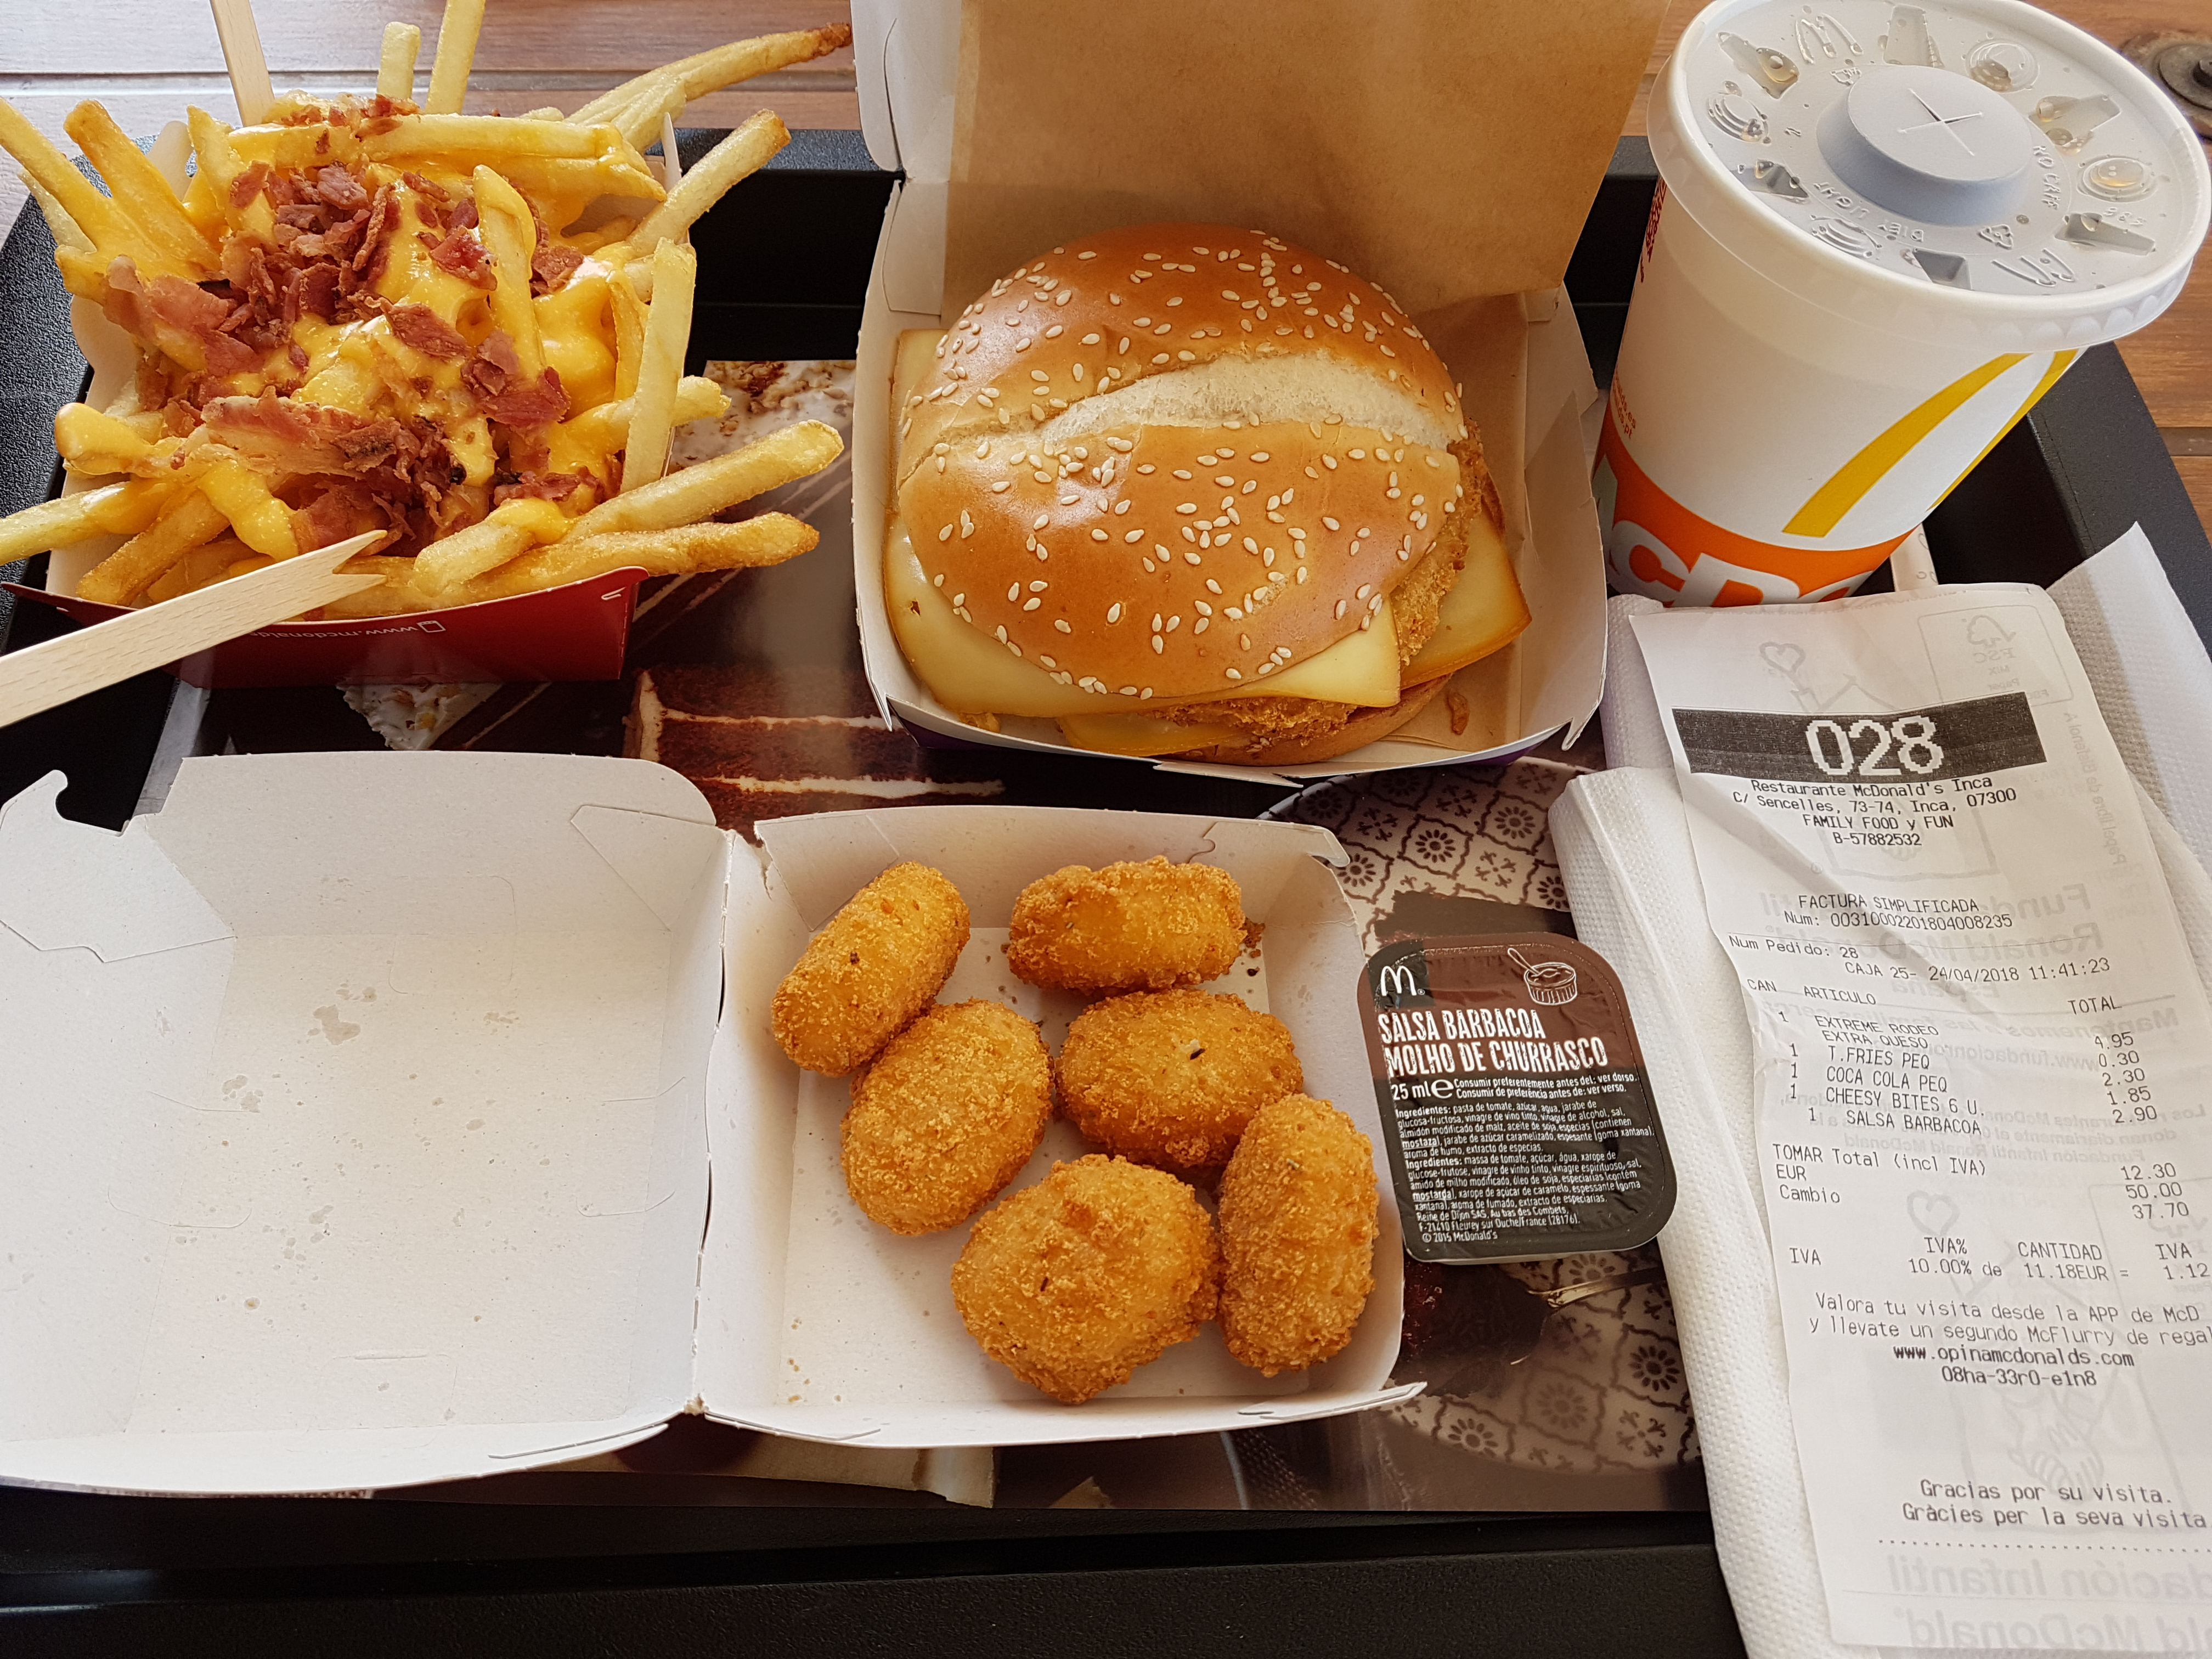 https://foodloader.net/Holz_2018-04-24_McDonalds.jpg